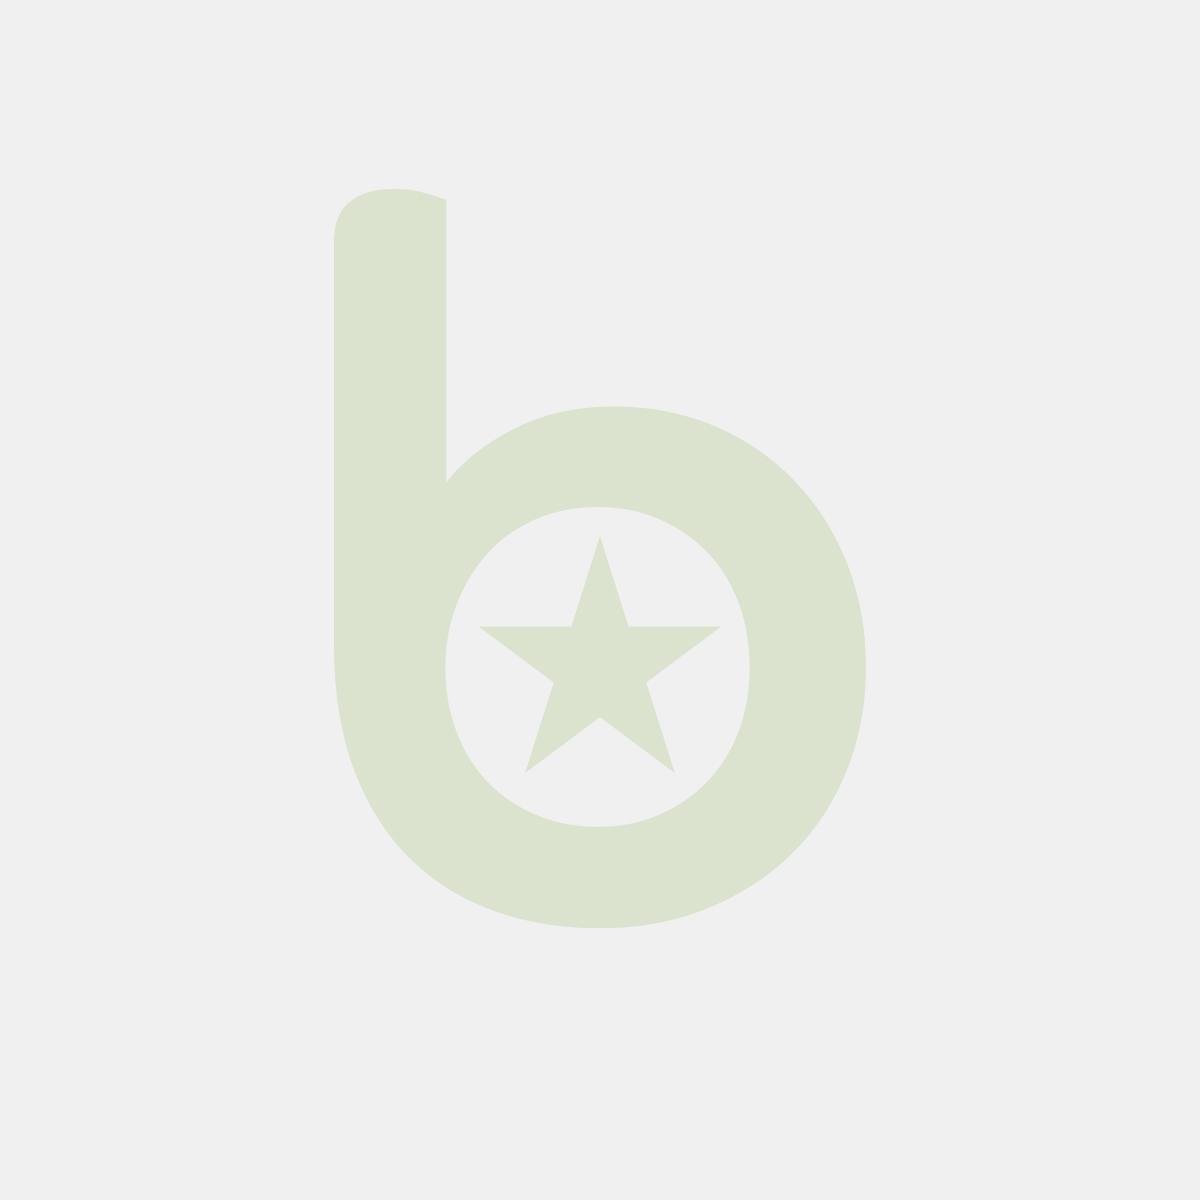 FINGERFOOD - pucharek 60ml PS 4x7,5cm transparentny op. 72 sztuki